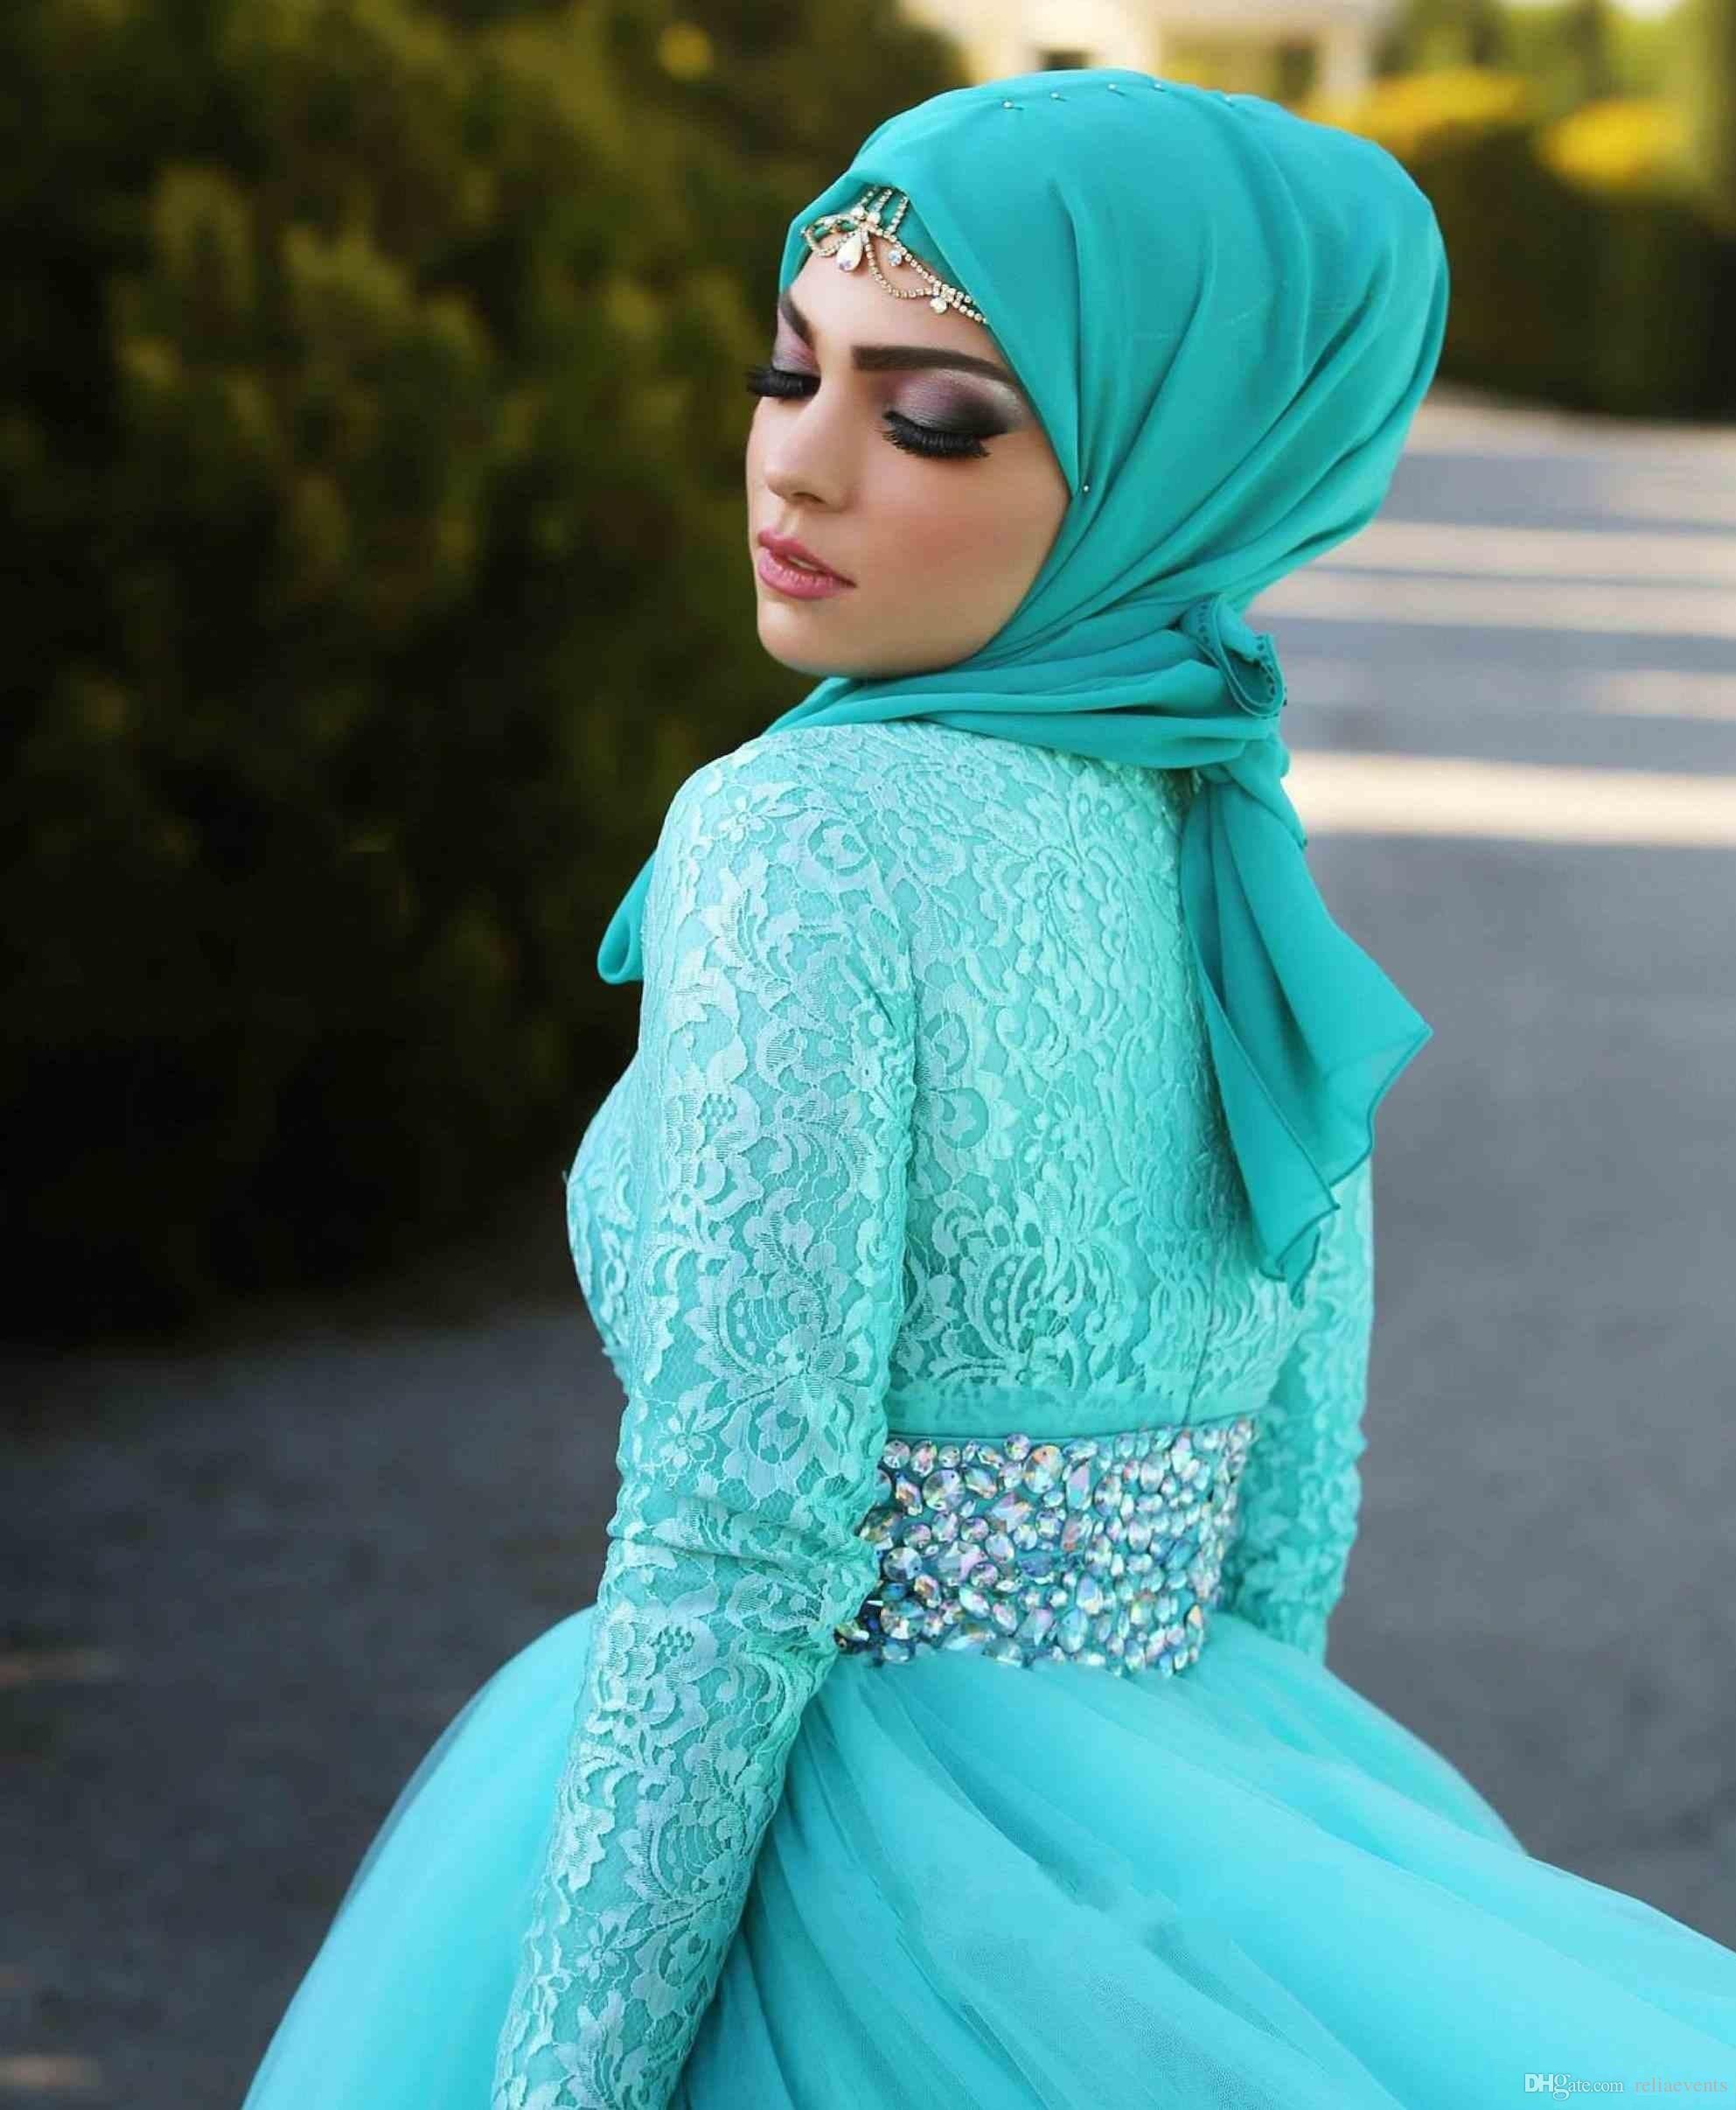 Stunning wedding dress from Dubai with beautiful matching turquoise ...